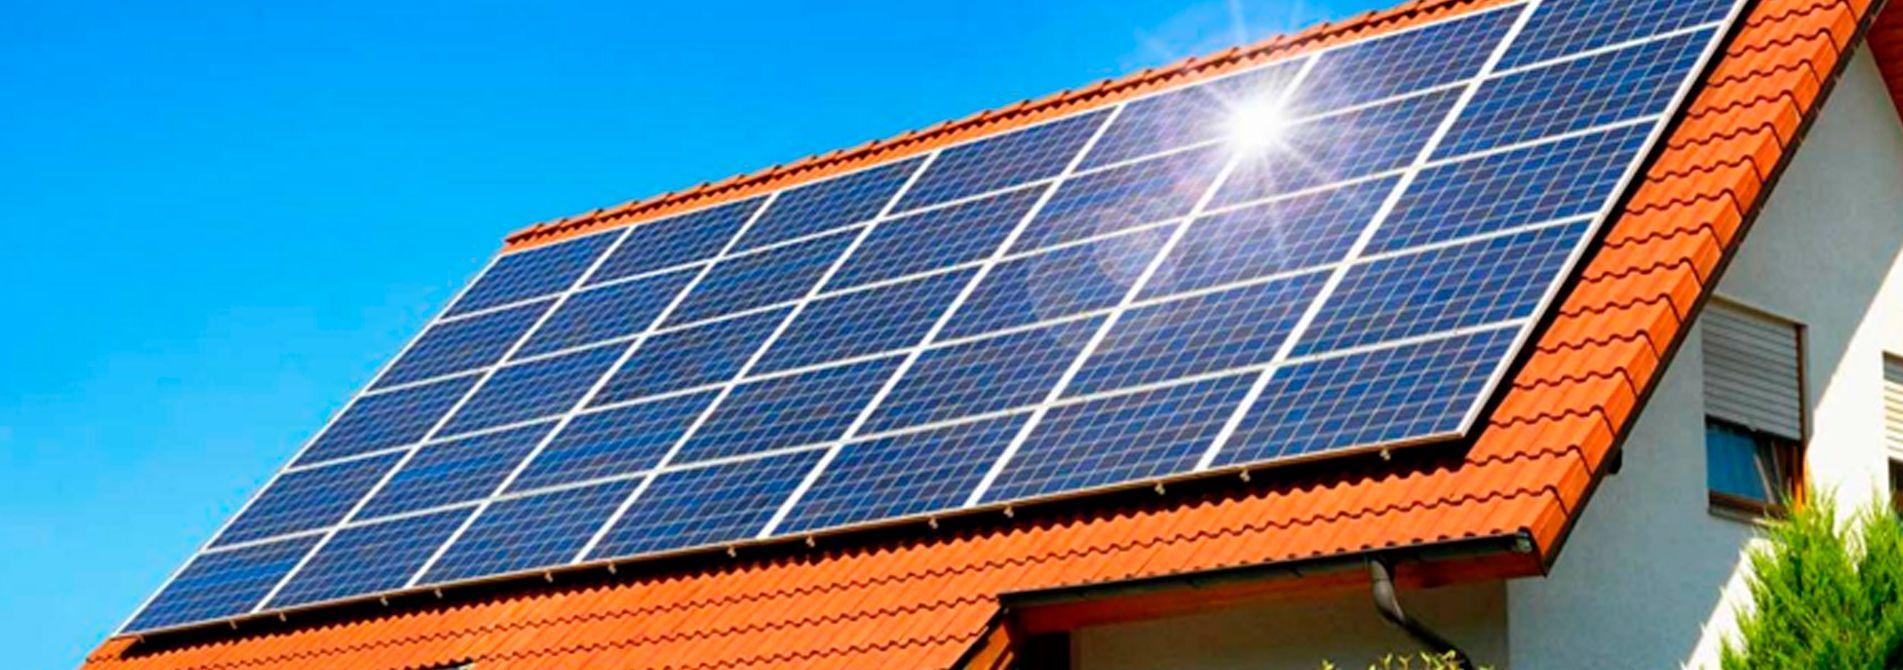 cabecera-energia-solar-fotovoltaica Energía solar fotovoltaica